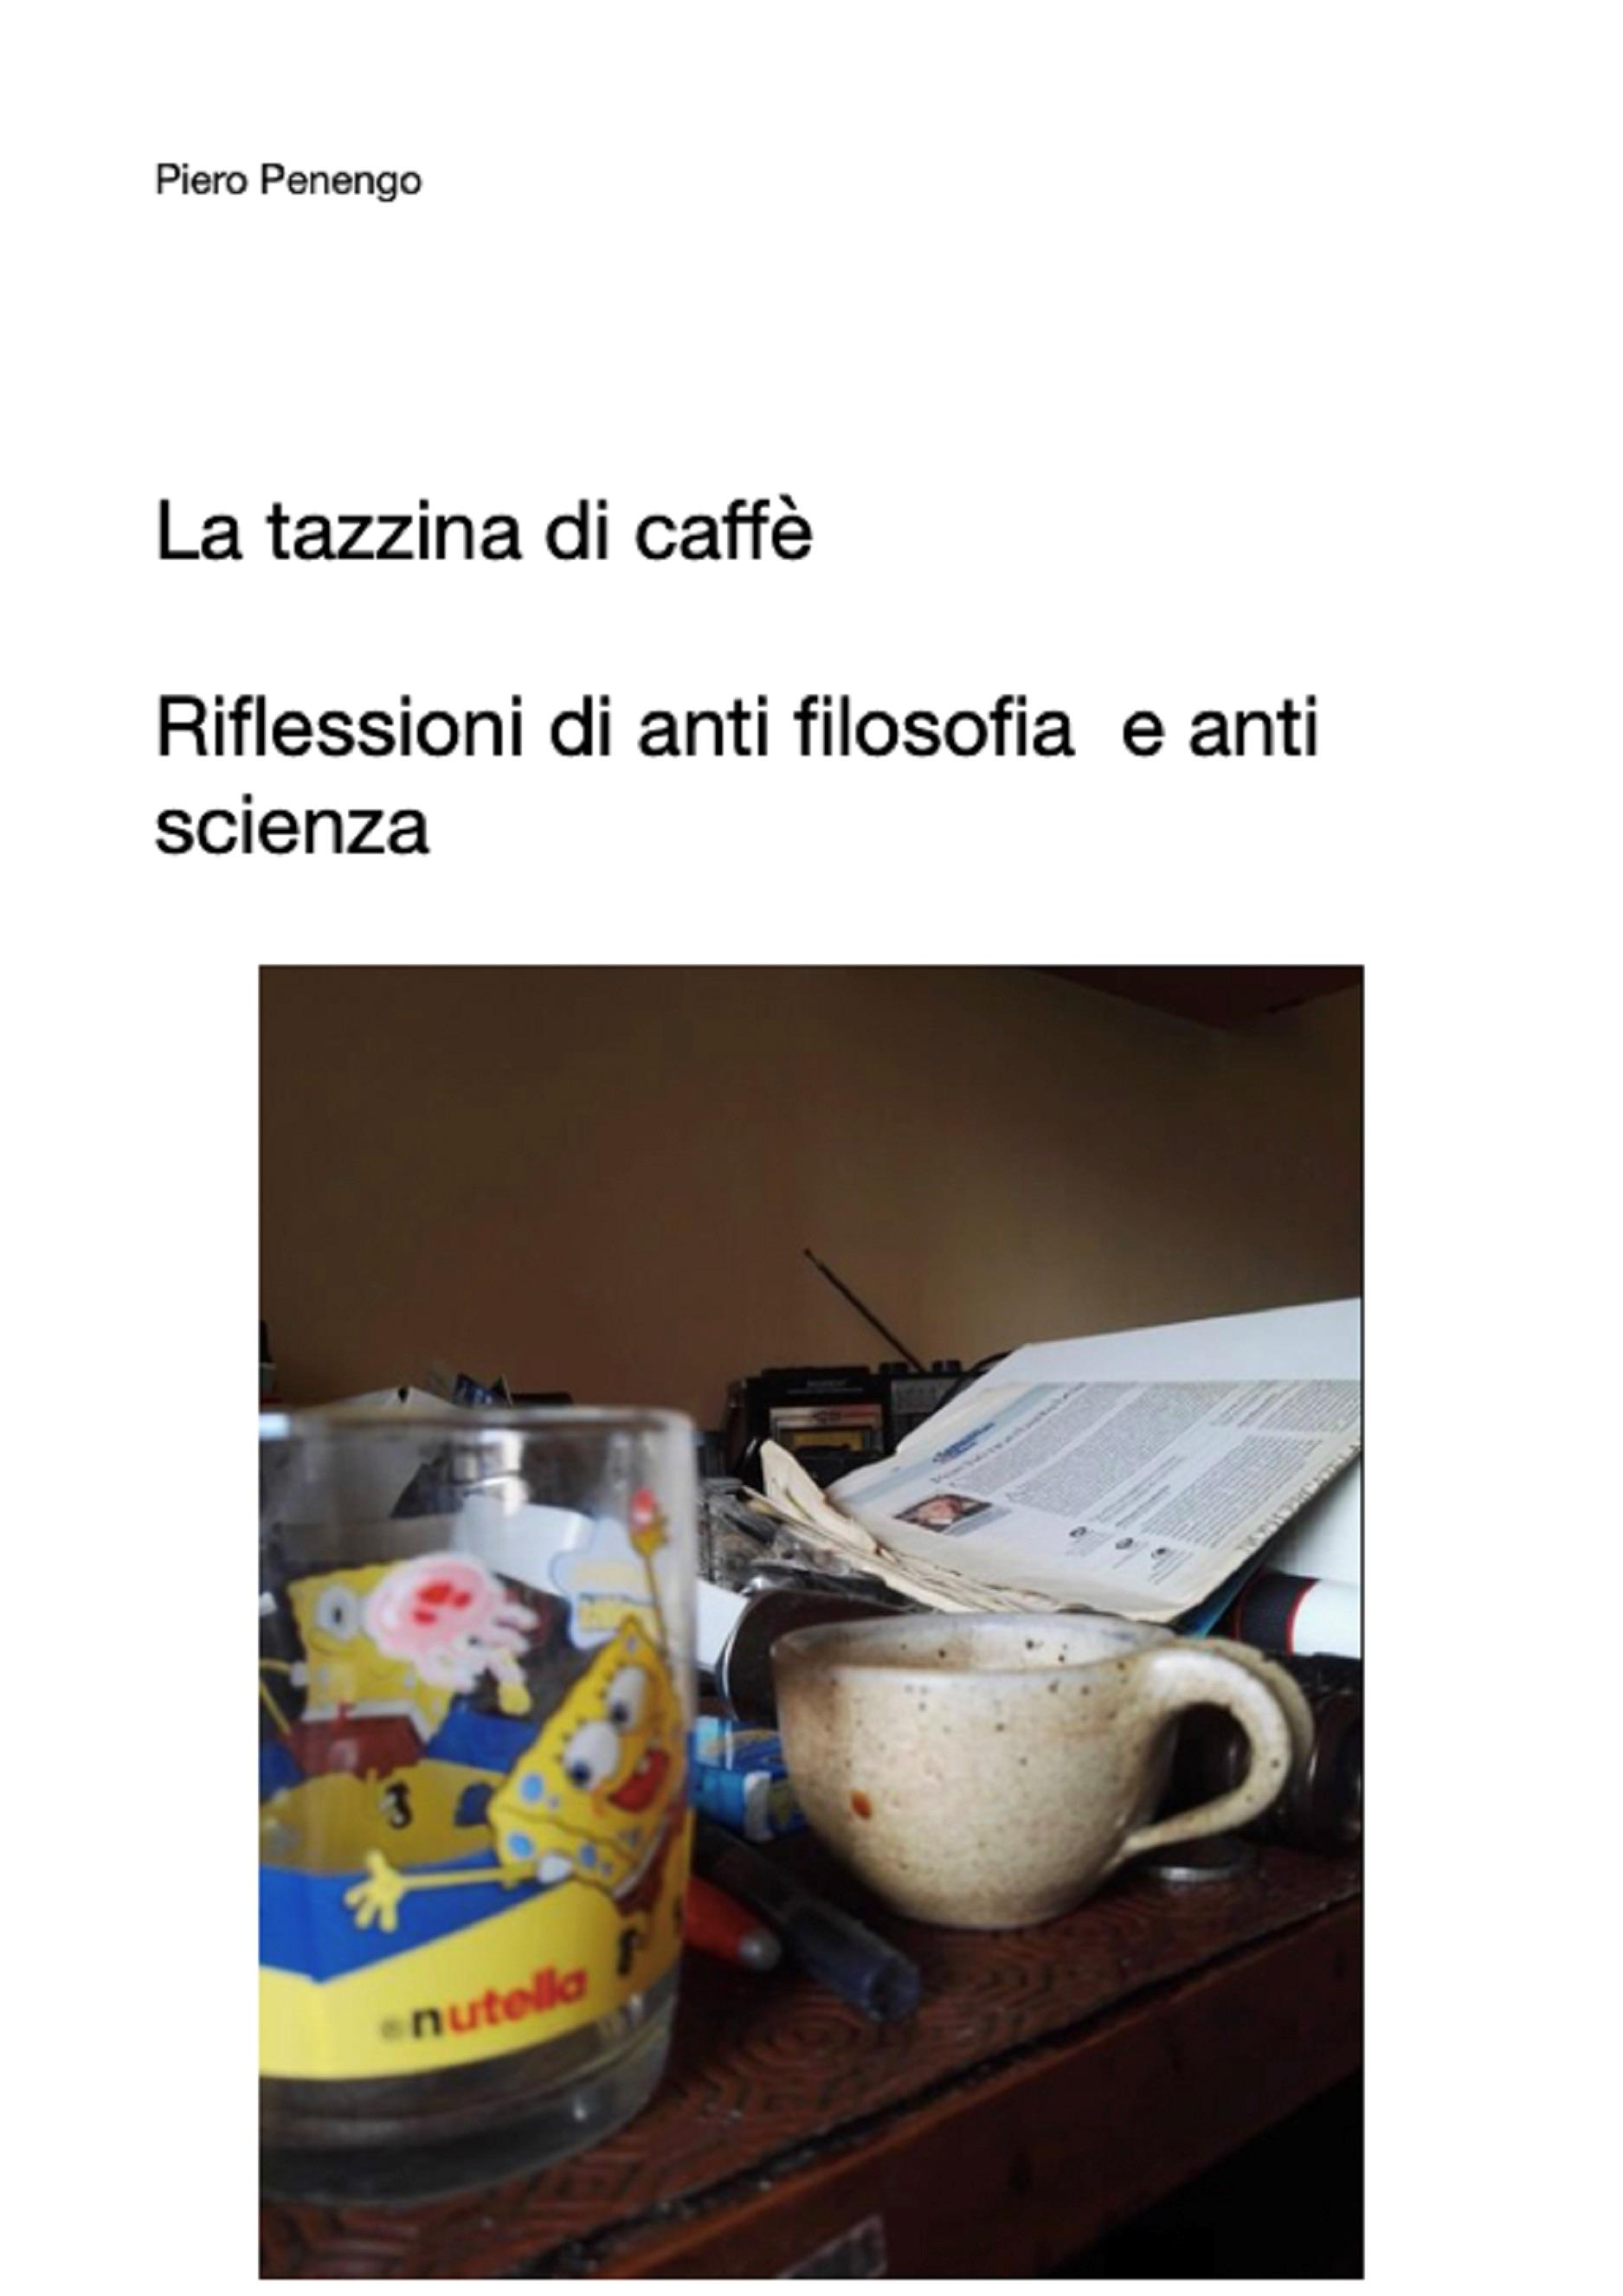 La tazzina di Caffé